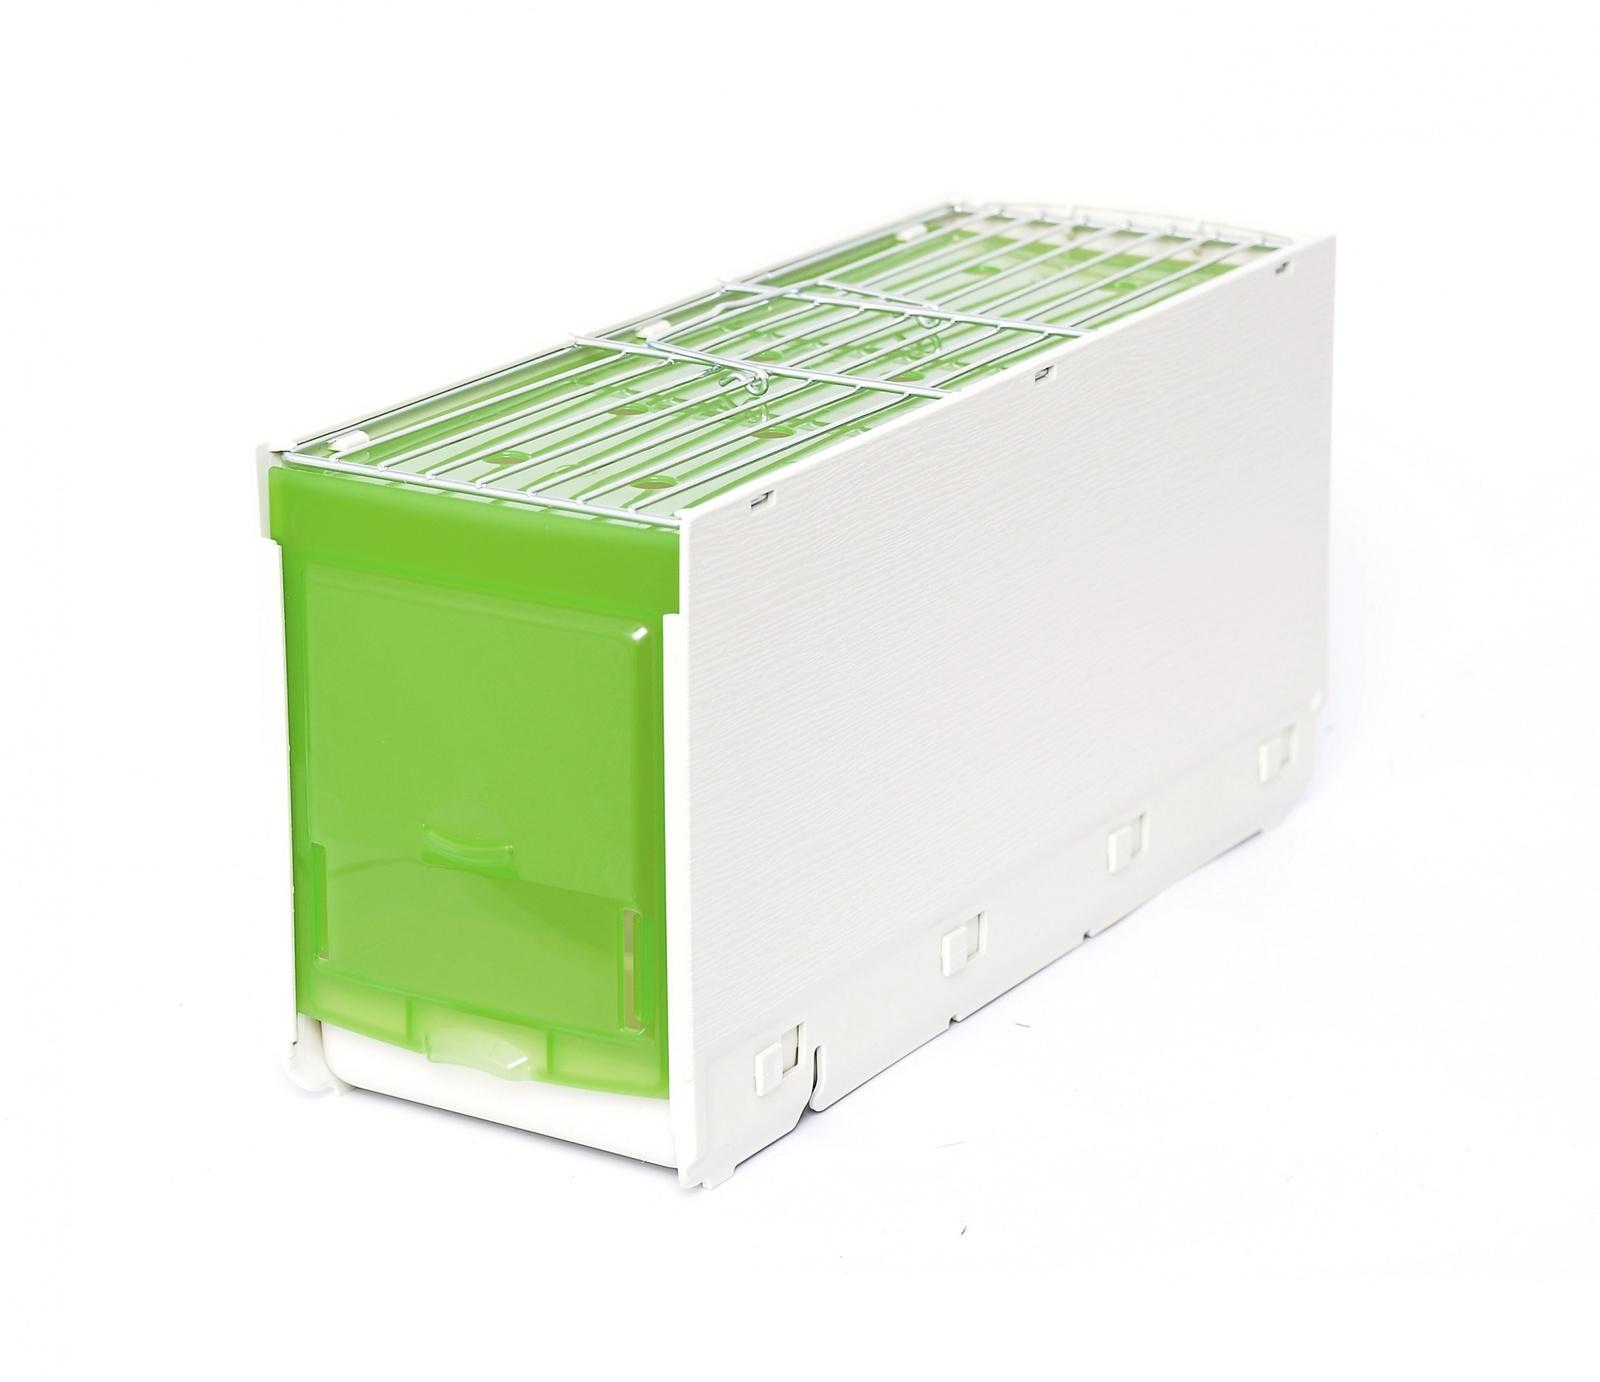 Benelux Переноска для птиц пластиковая 31 * 11.5 * 16 см (Transportcage plastic large) 14777 от Ravta